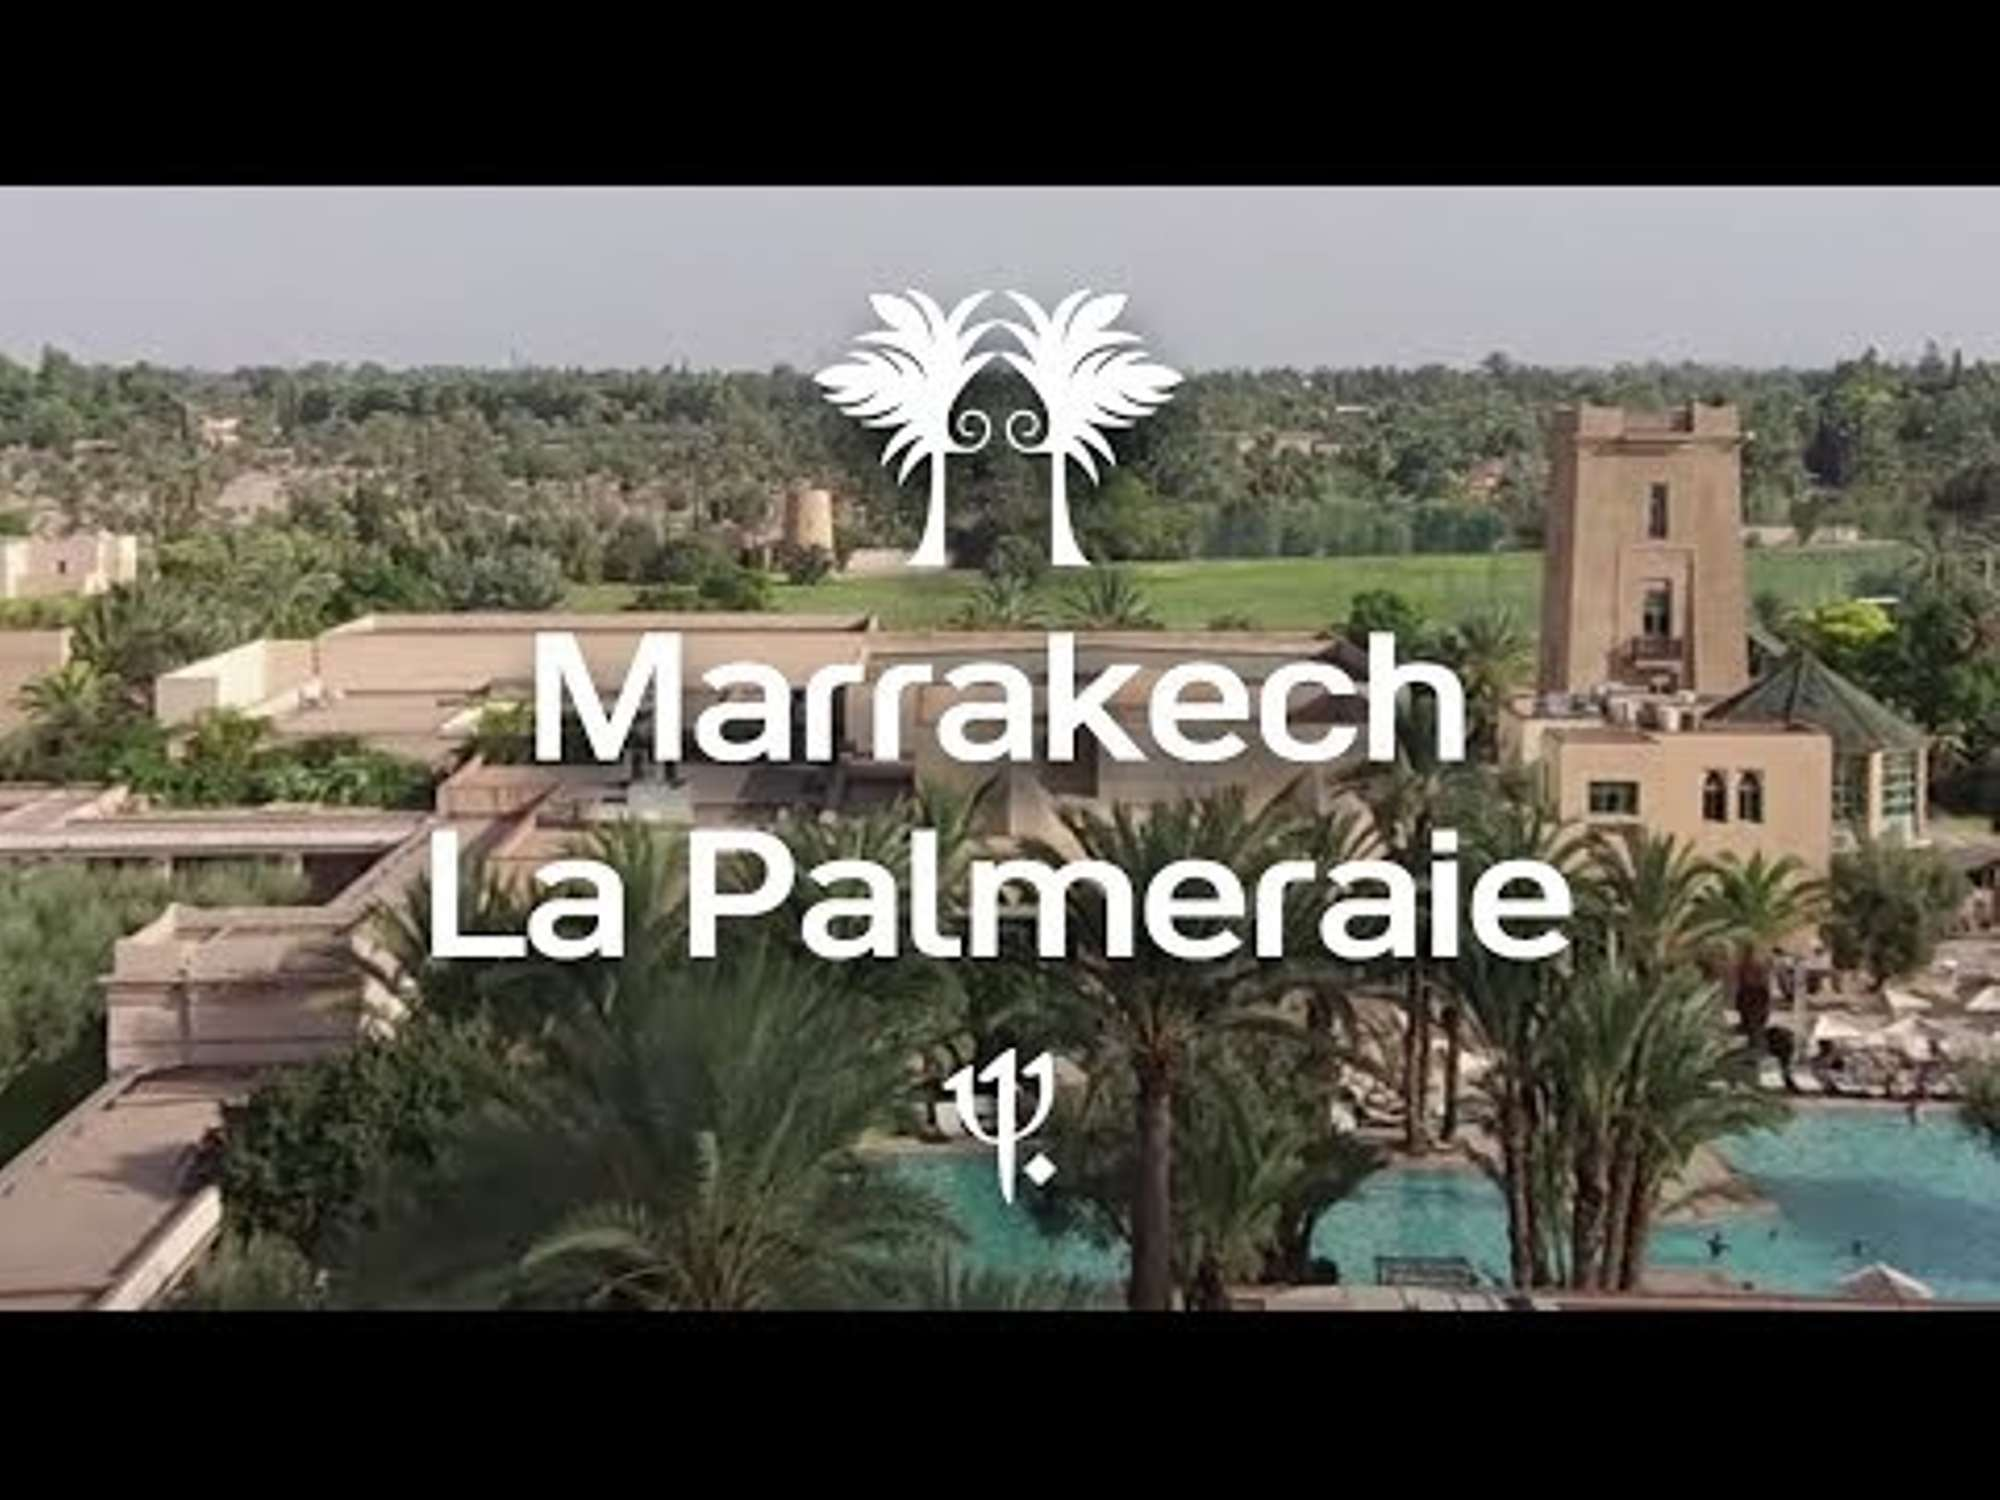 Open Marrakech La Palmeraie videos slideshow gallery at 1